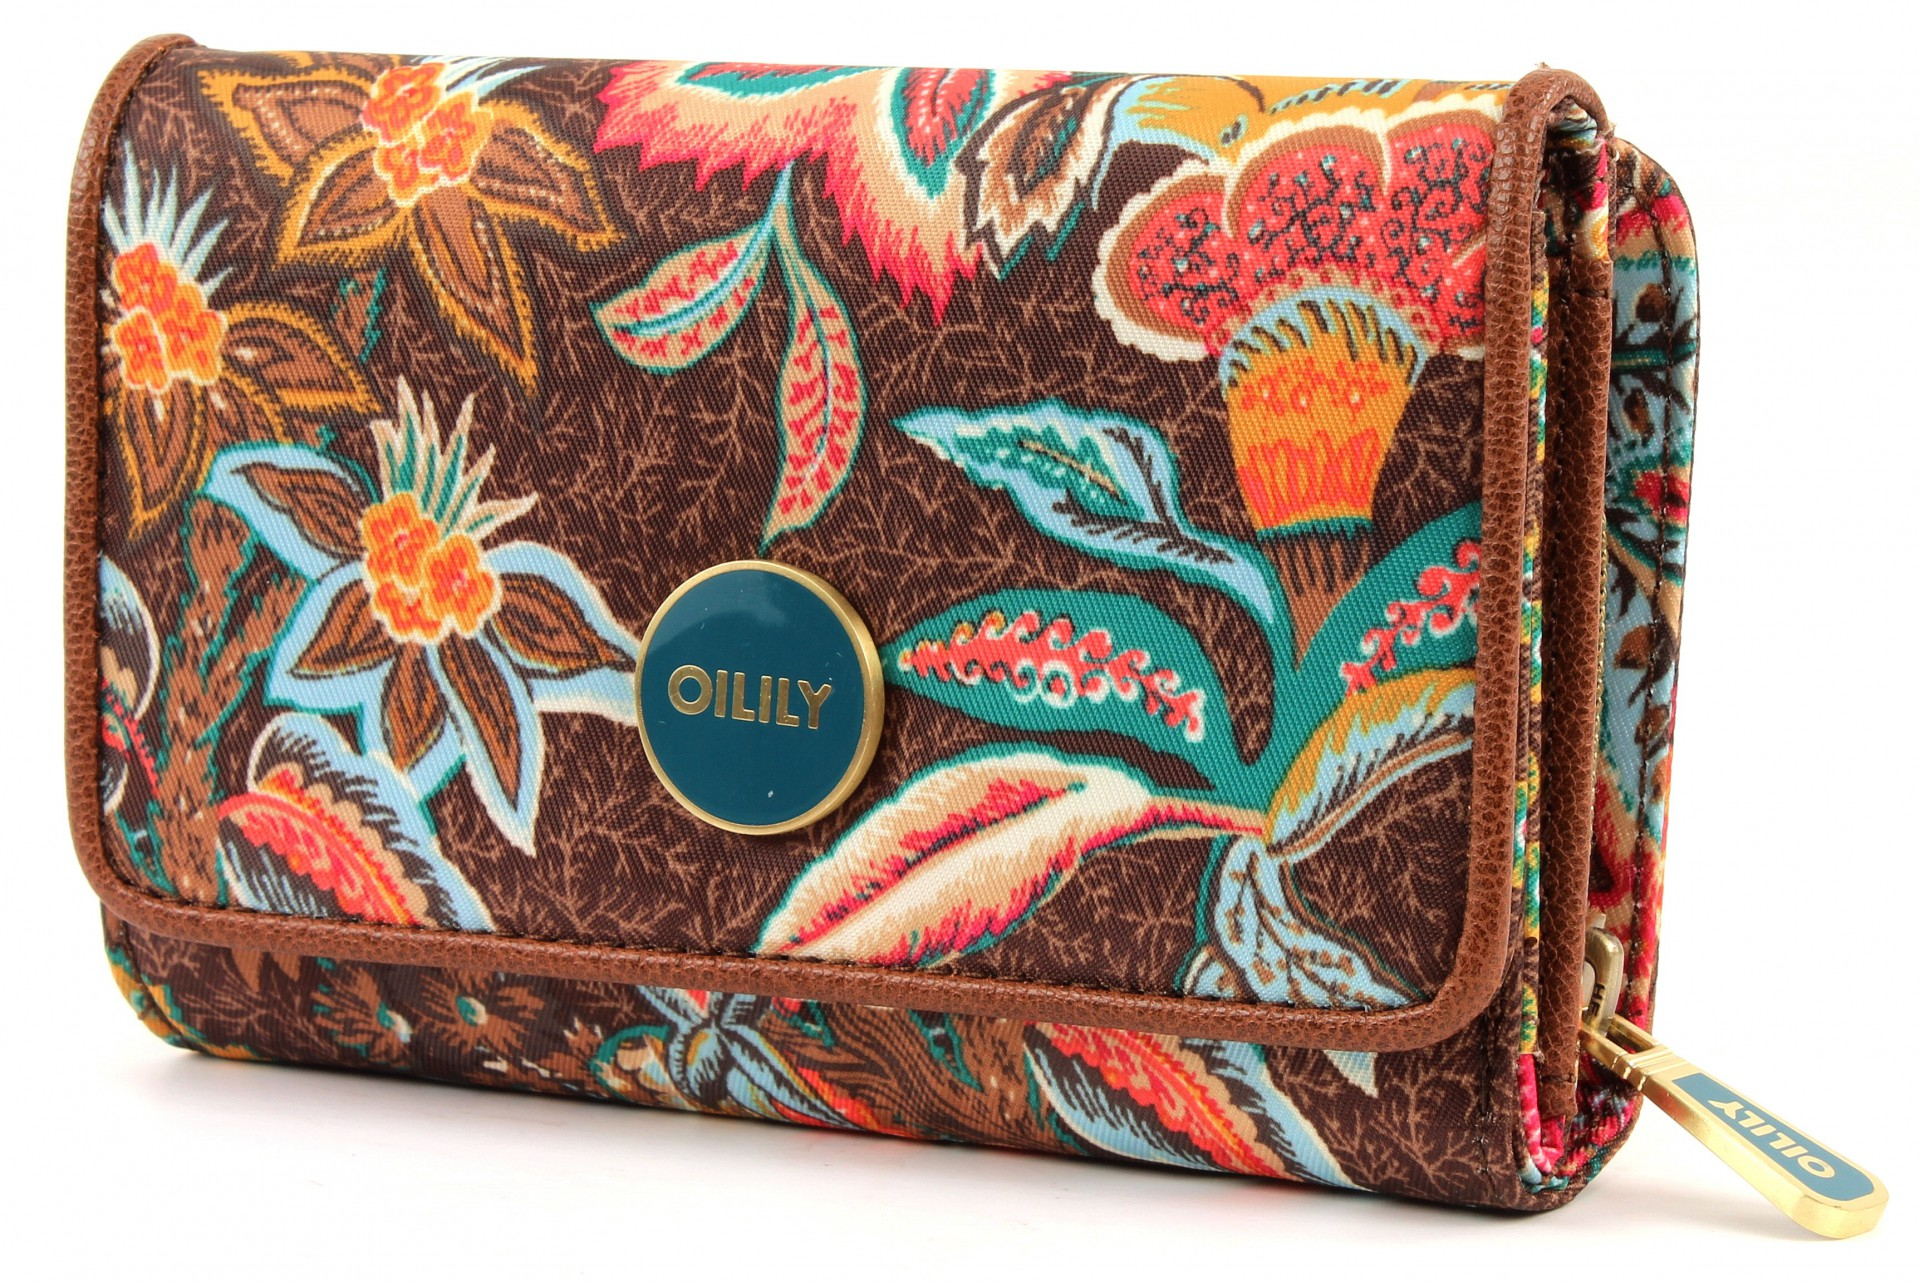 oilily jatin flowers s wallet geldb rse portemonnaie. Black Bedroom Furniture Sets. Home Design Ideas